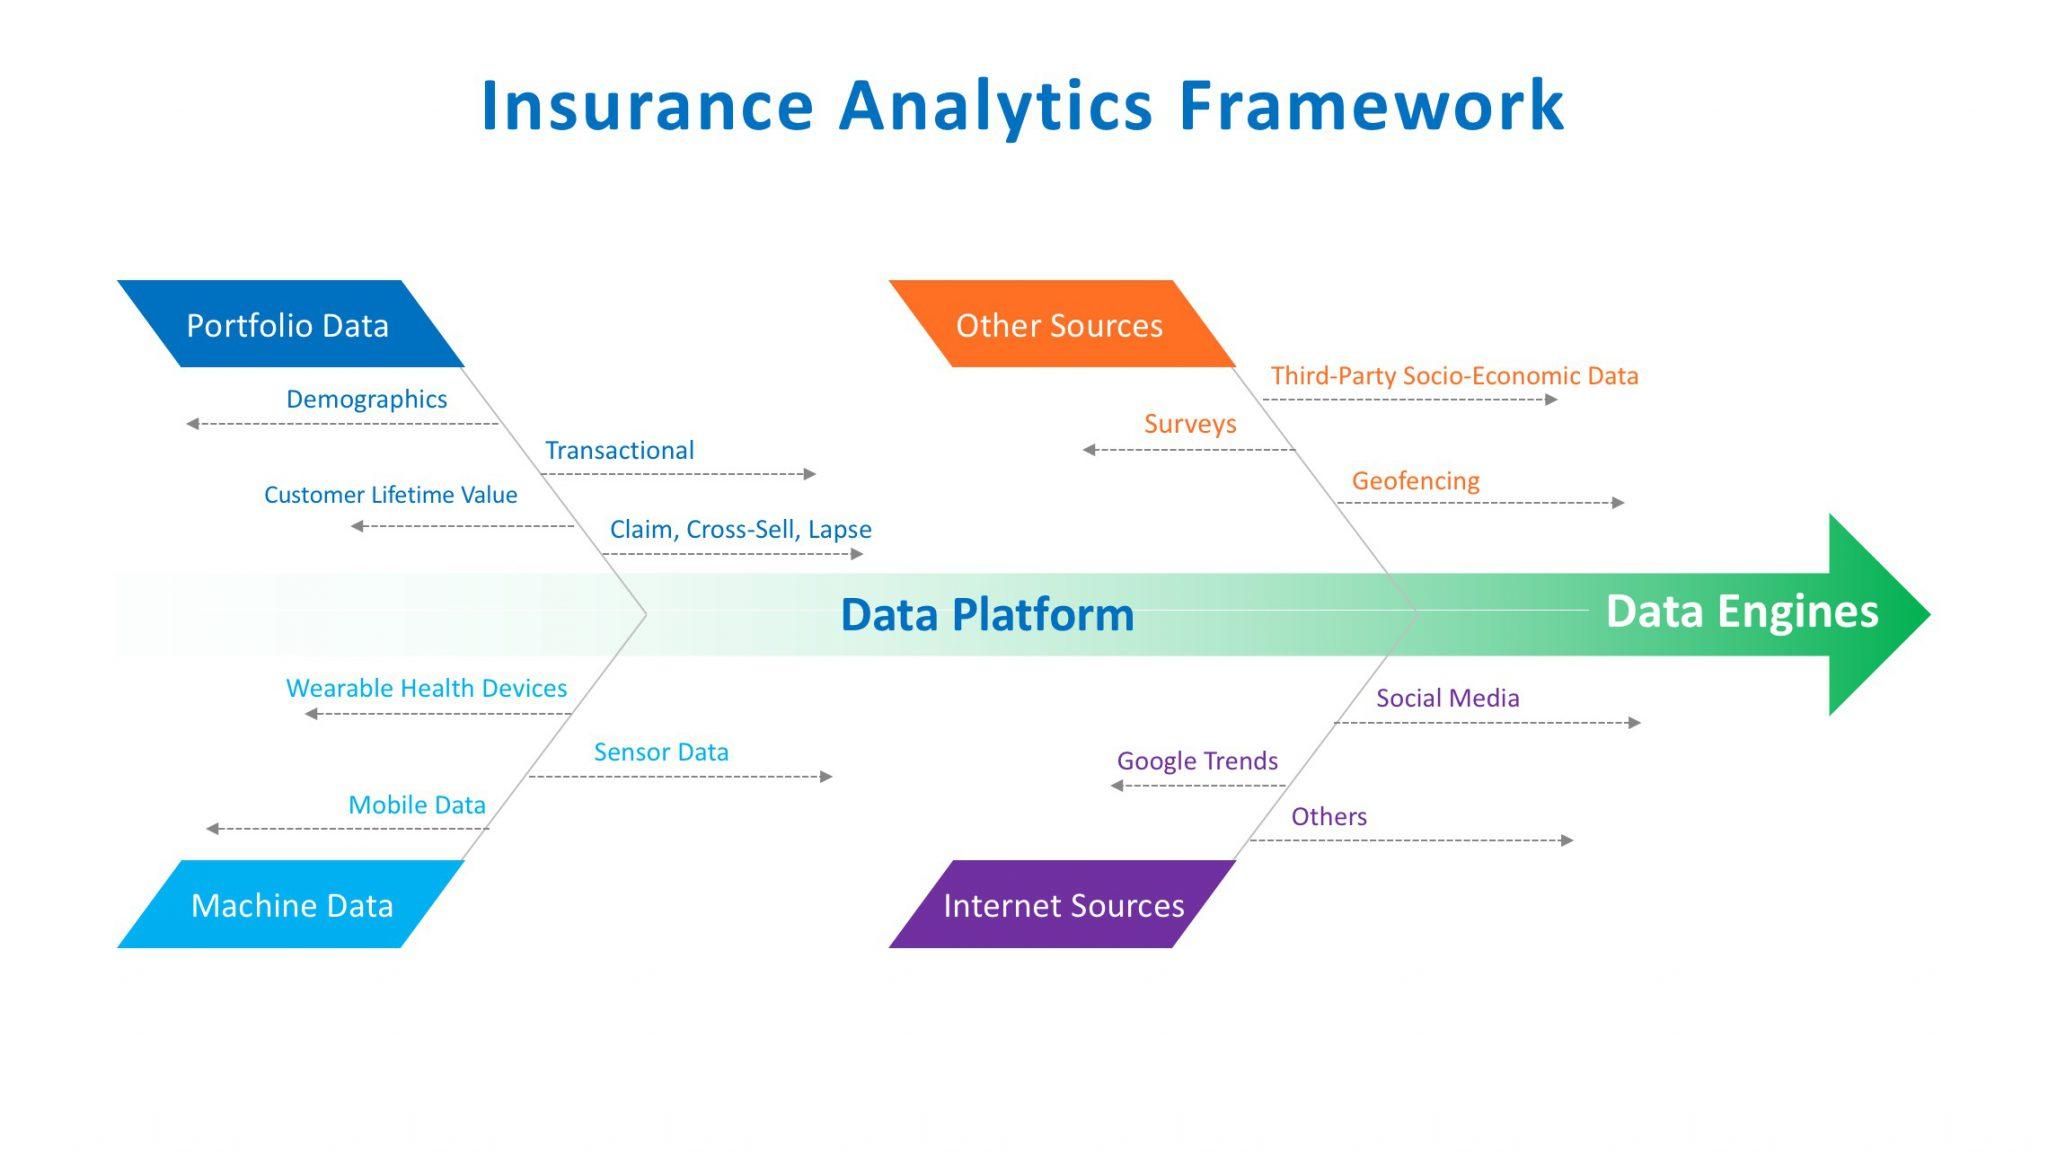 Insurance Analytics Framework